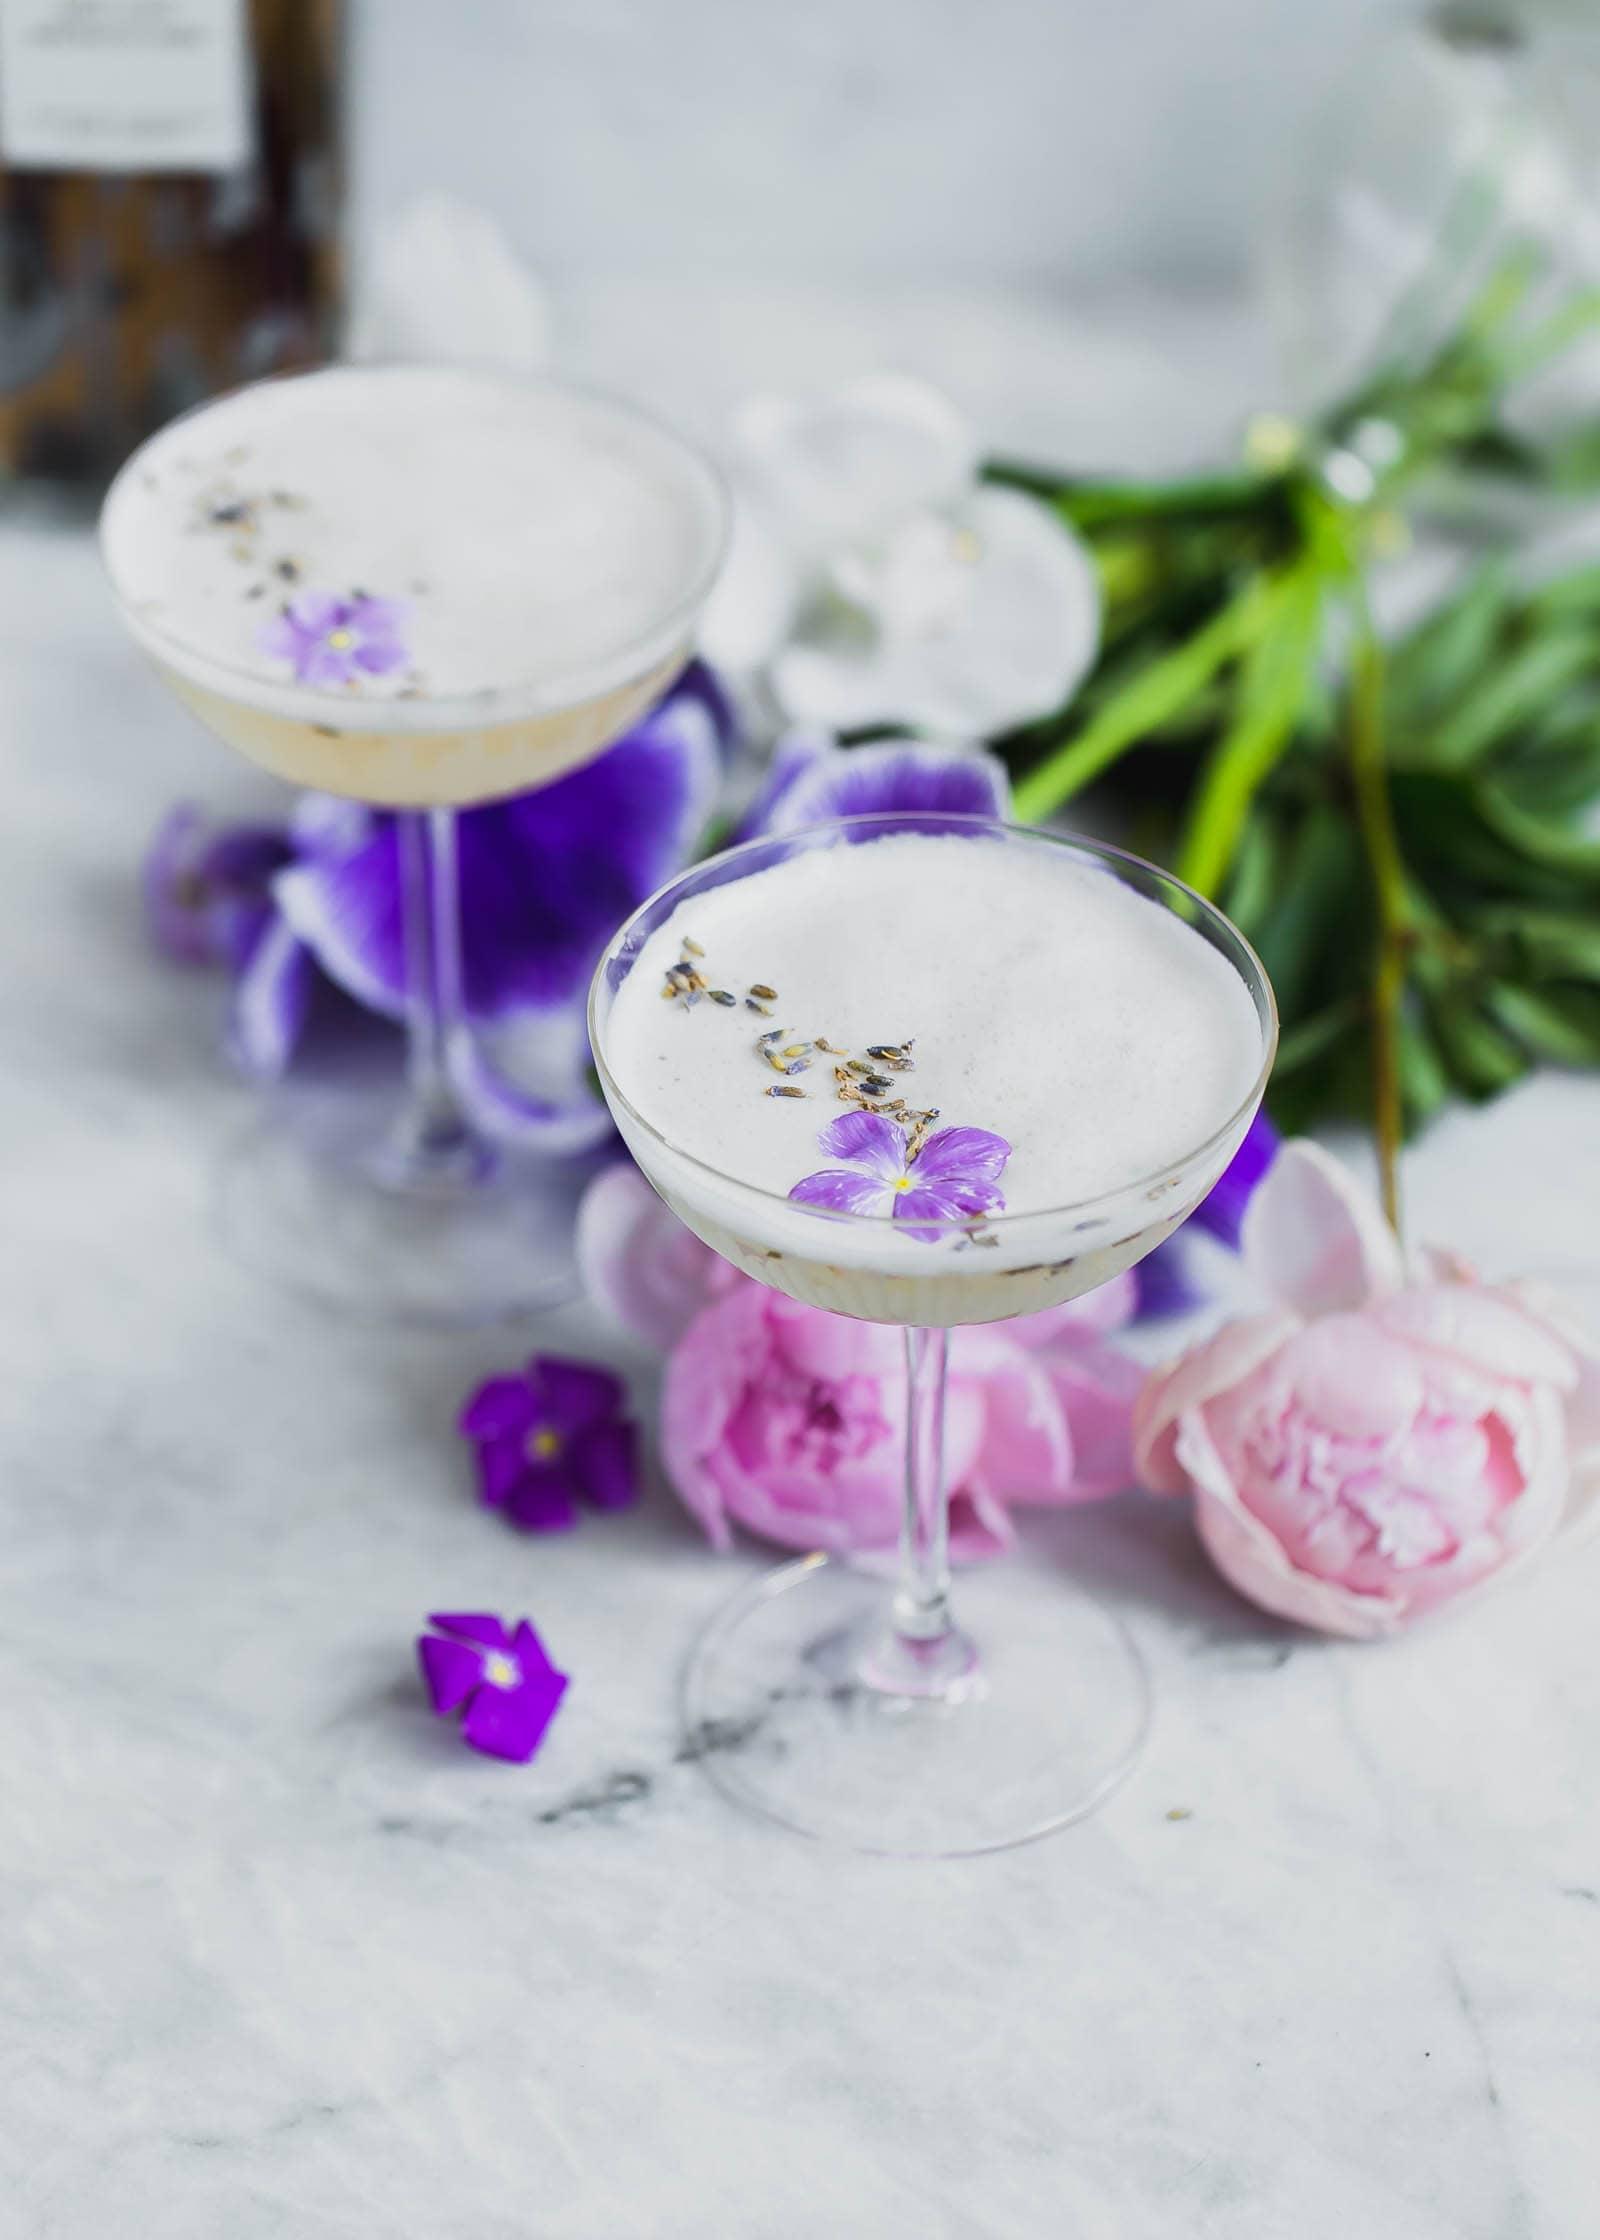 Lavender Coconut Vodka Sours topped with violets